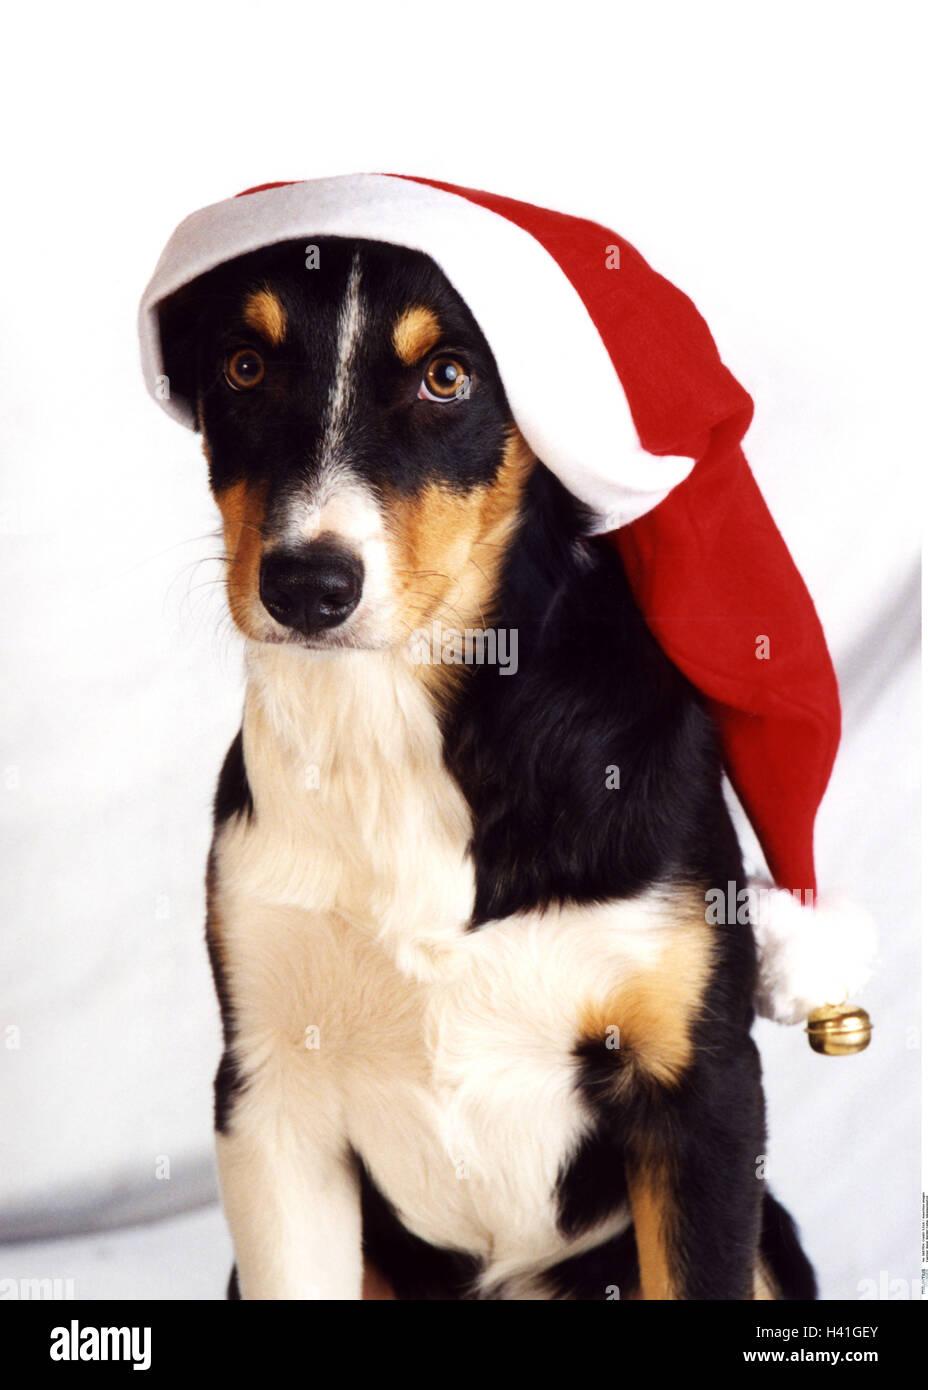 Border Colliechristmaschristmas Capchristmas Perioddogsanta